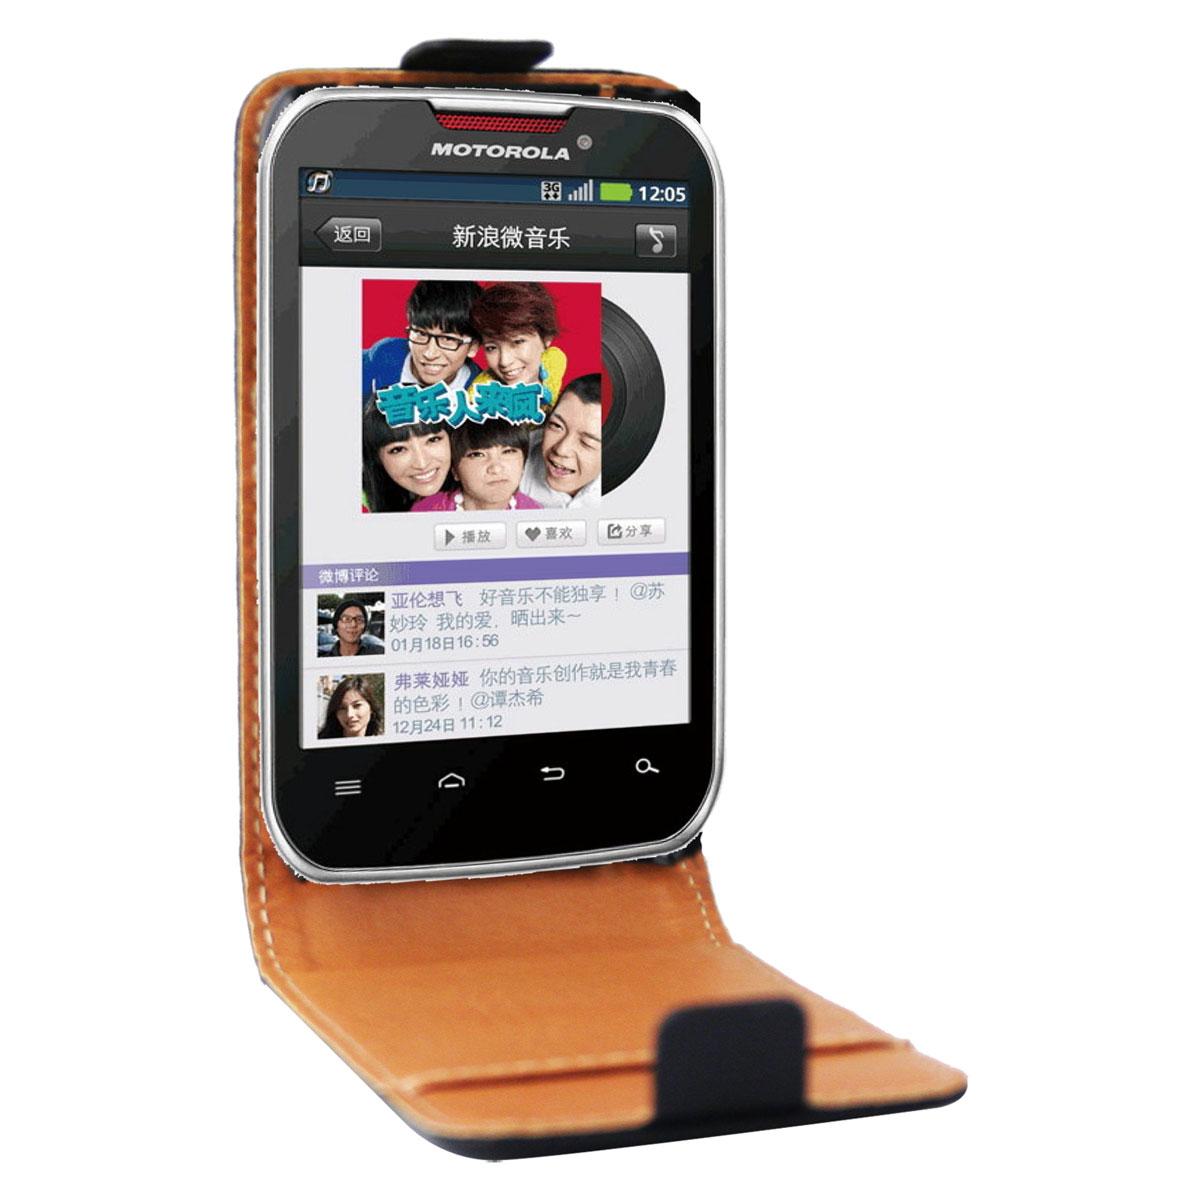 Etui téléphone Swiss Charger Etui Cuir Flip Noir Motorola MOTOSMART MIX XT550 Etui en cuir véritable pour Motorola MOTOSMART MIX XT550